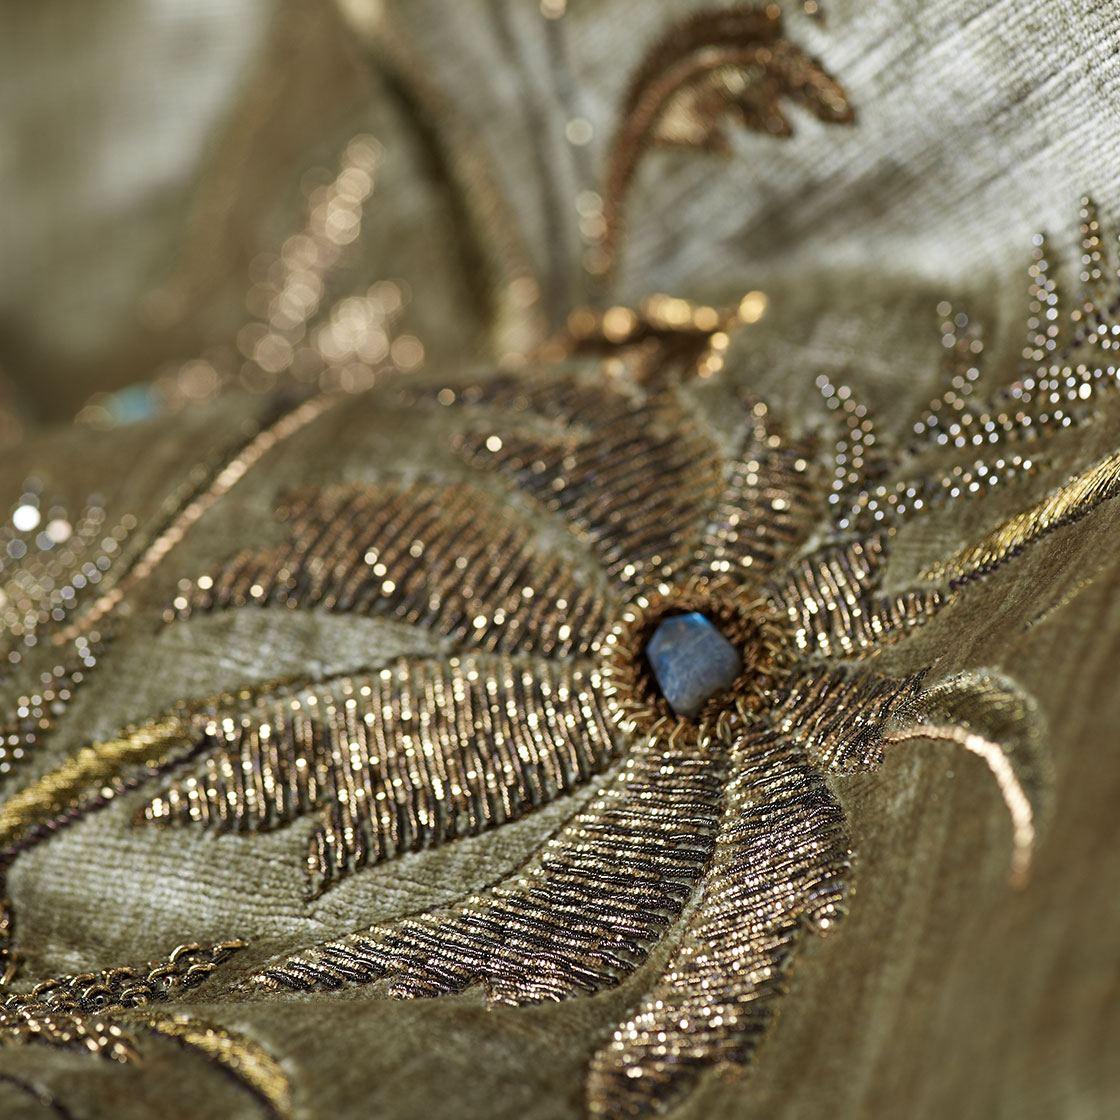 Isolde - Old Gold On Como Fern - Beaumont & Fletcher - Beaumont & Fletcher